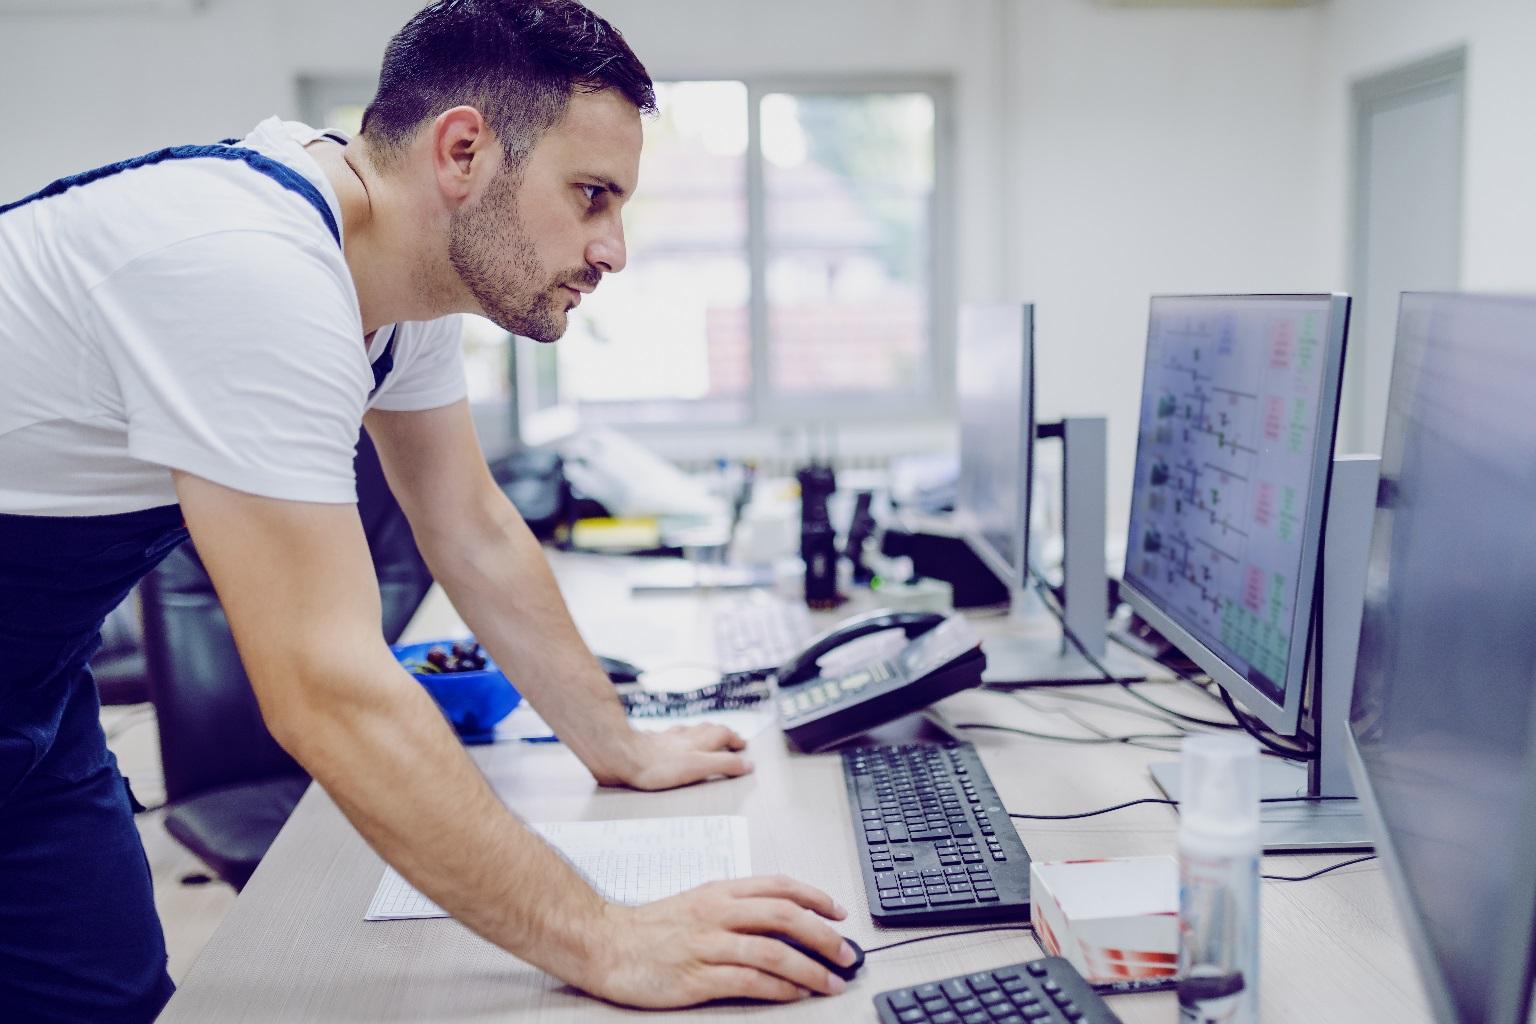 Workman checking a monitor